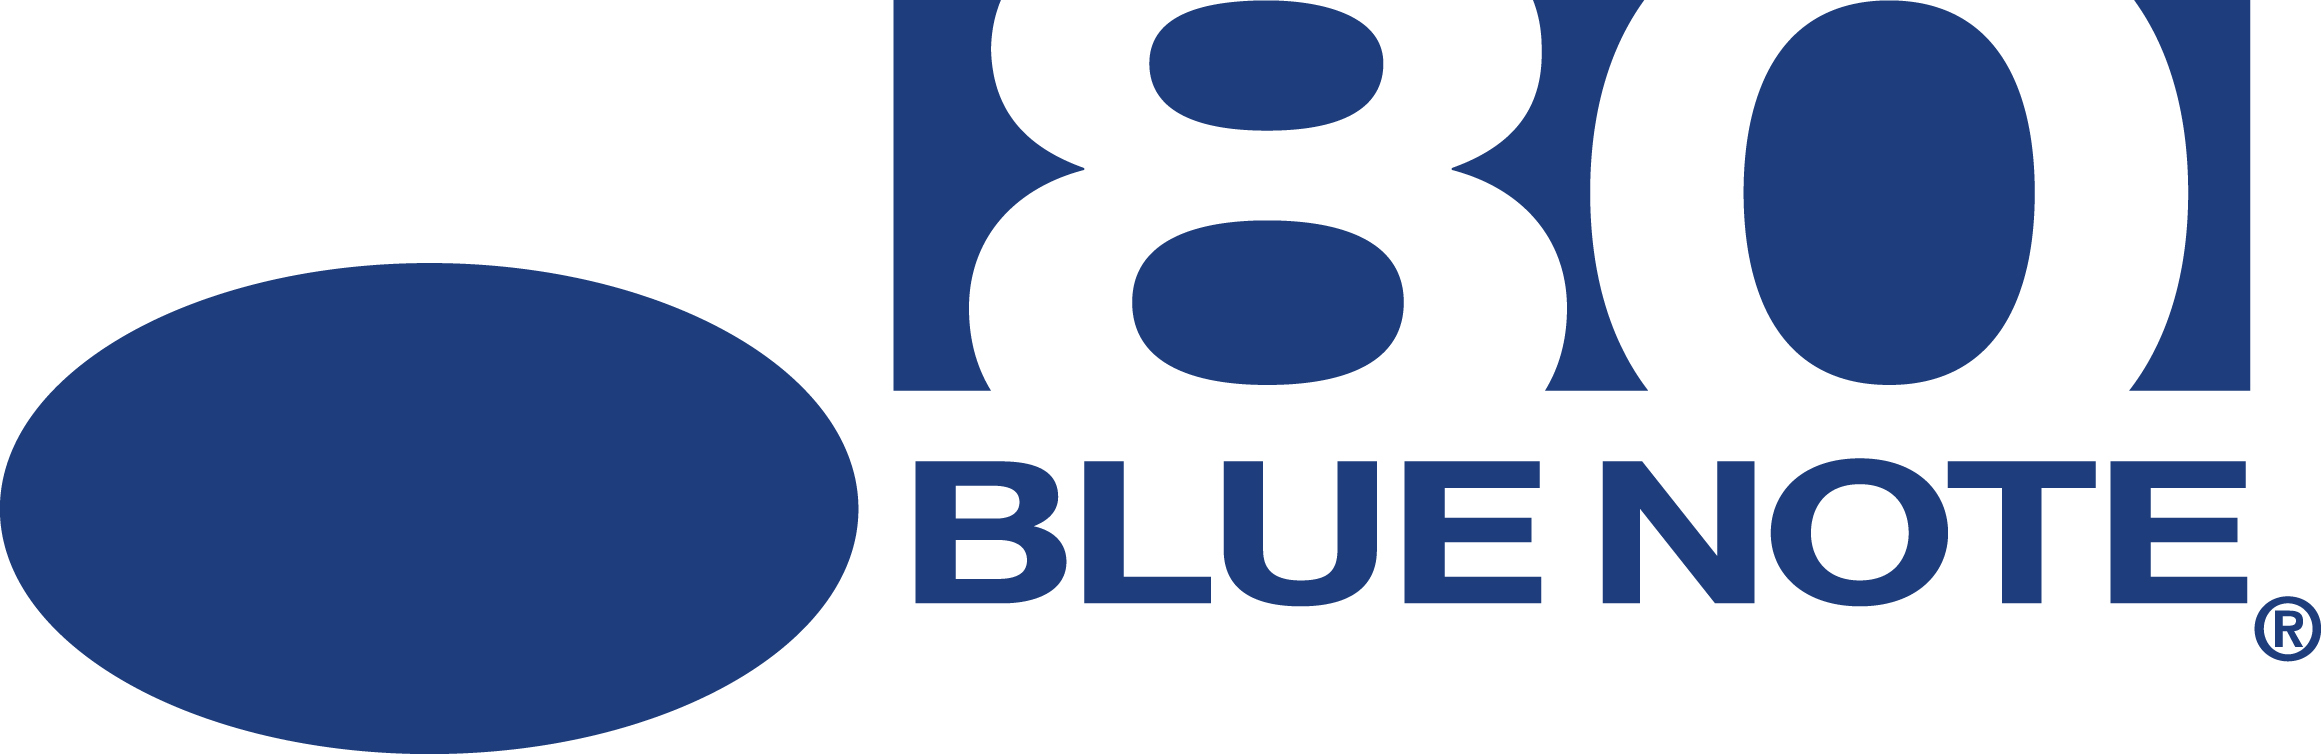 BlueNote80_logo.jpg